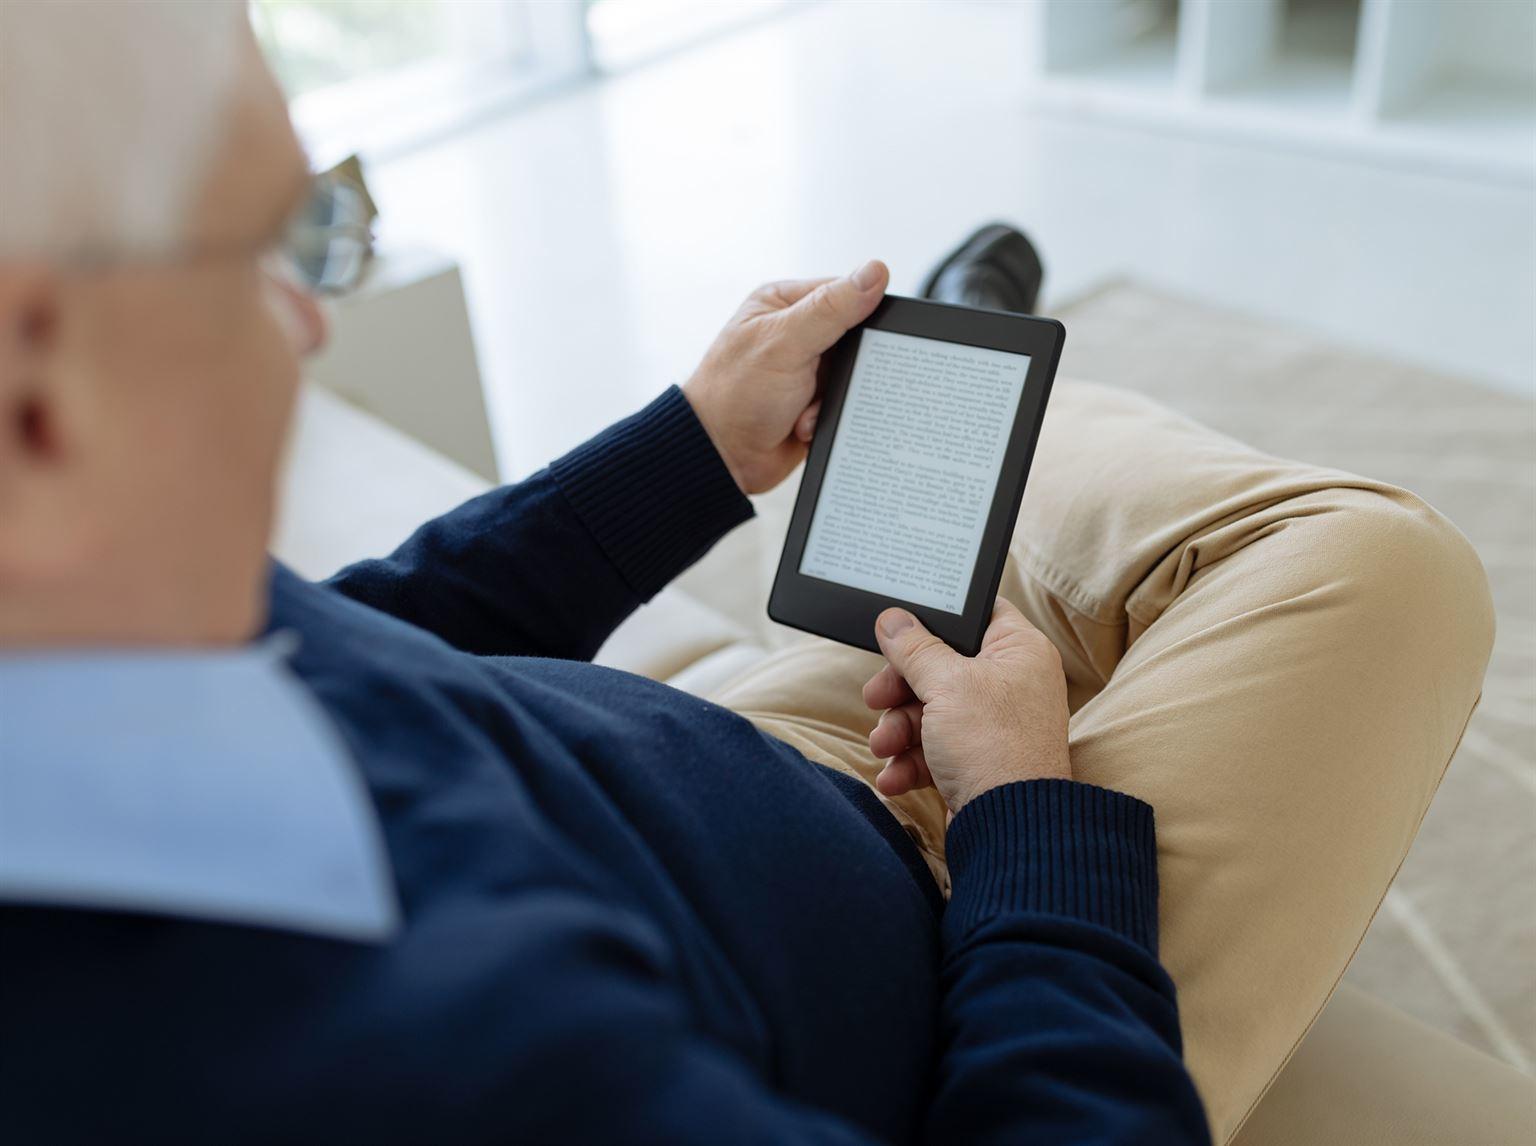 comment choisir la bonne liseuse prot gez. Black Bedroom Furniture Sets. Home Design Ideas